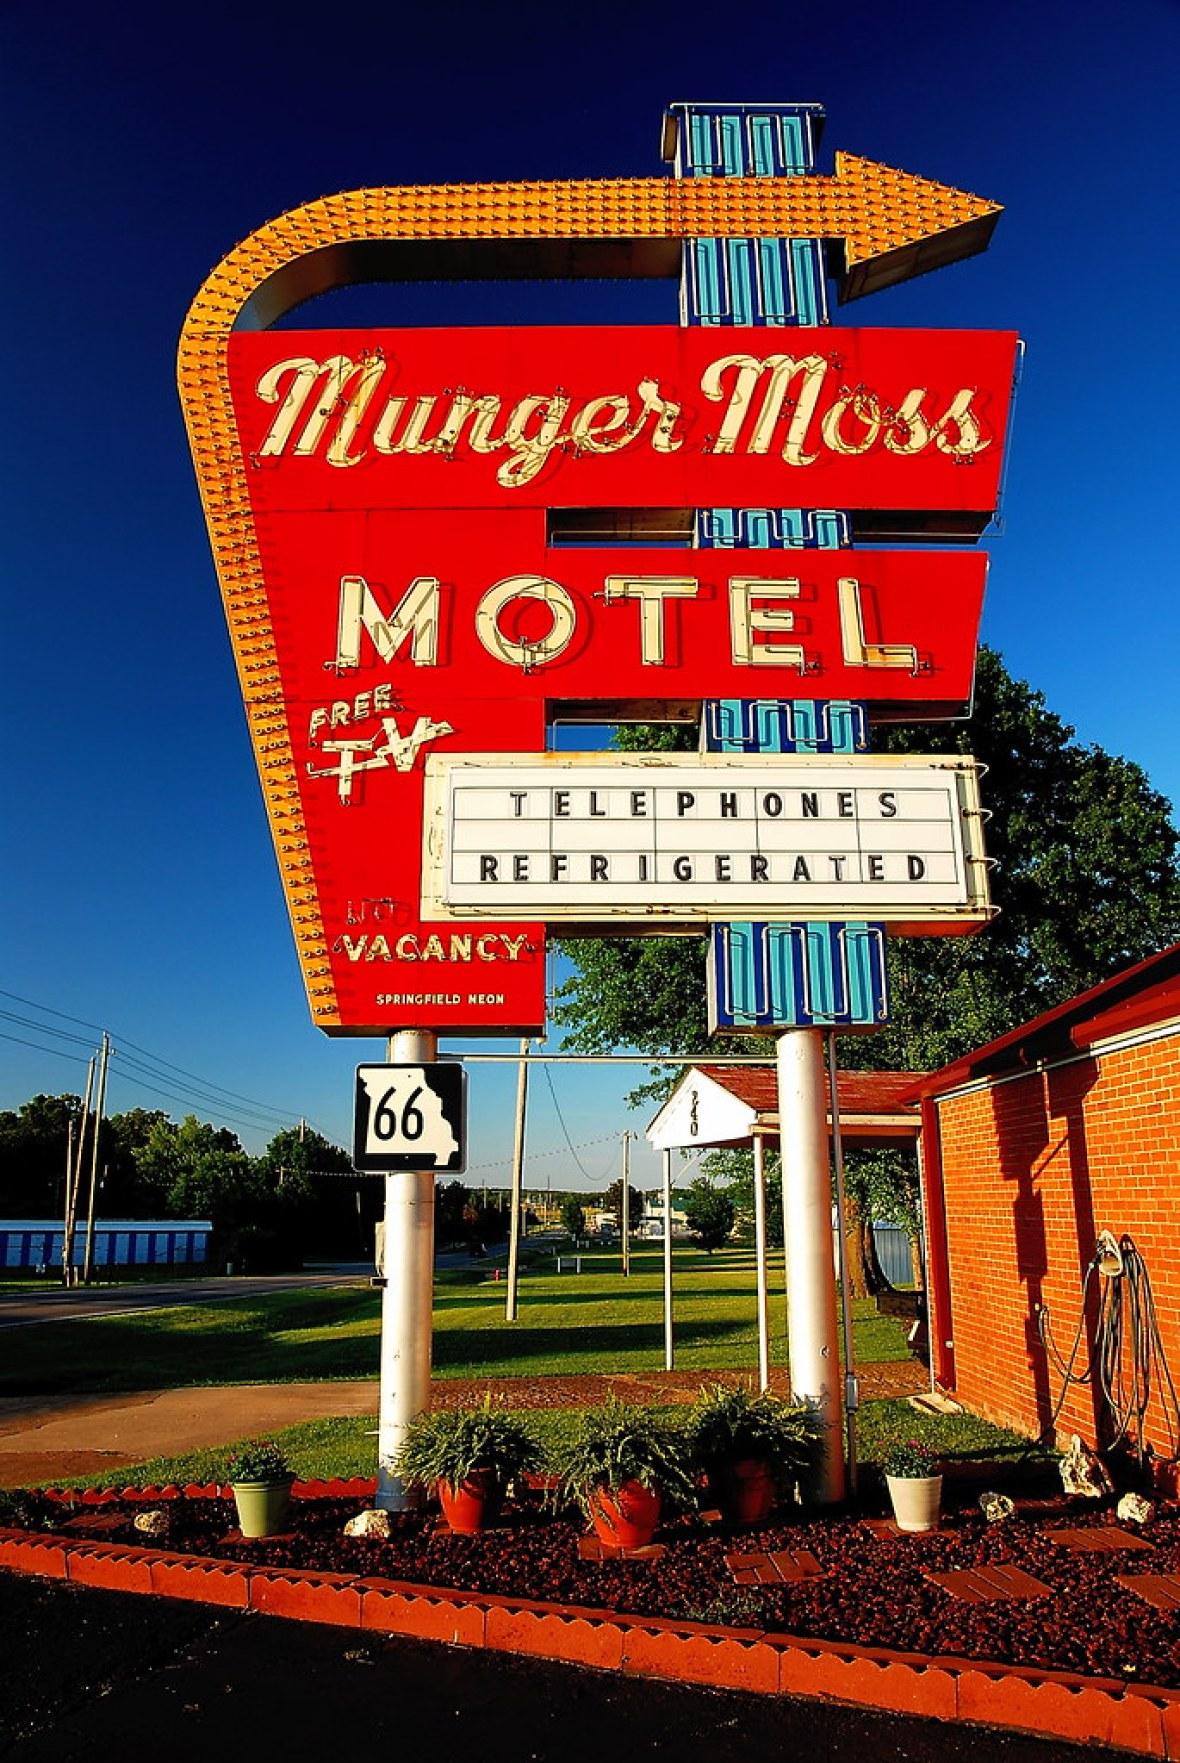 Munger Moss Motel - 1336 East Route 66, Lebanon, Missouri U.S.A. - June 14, 2014